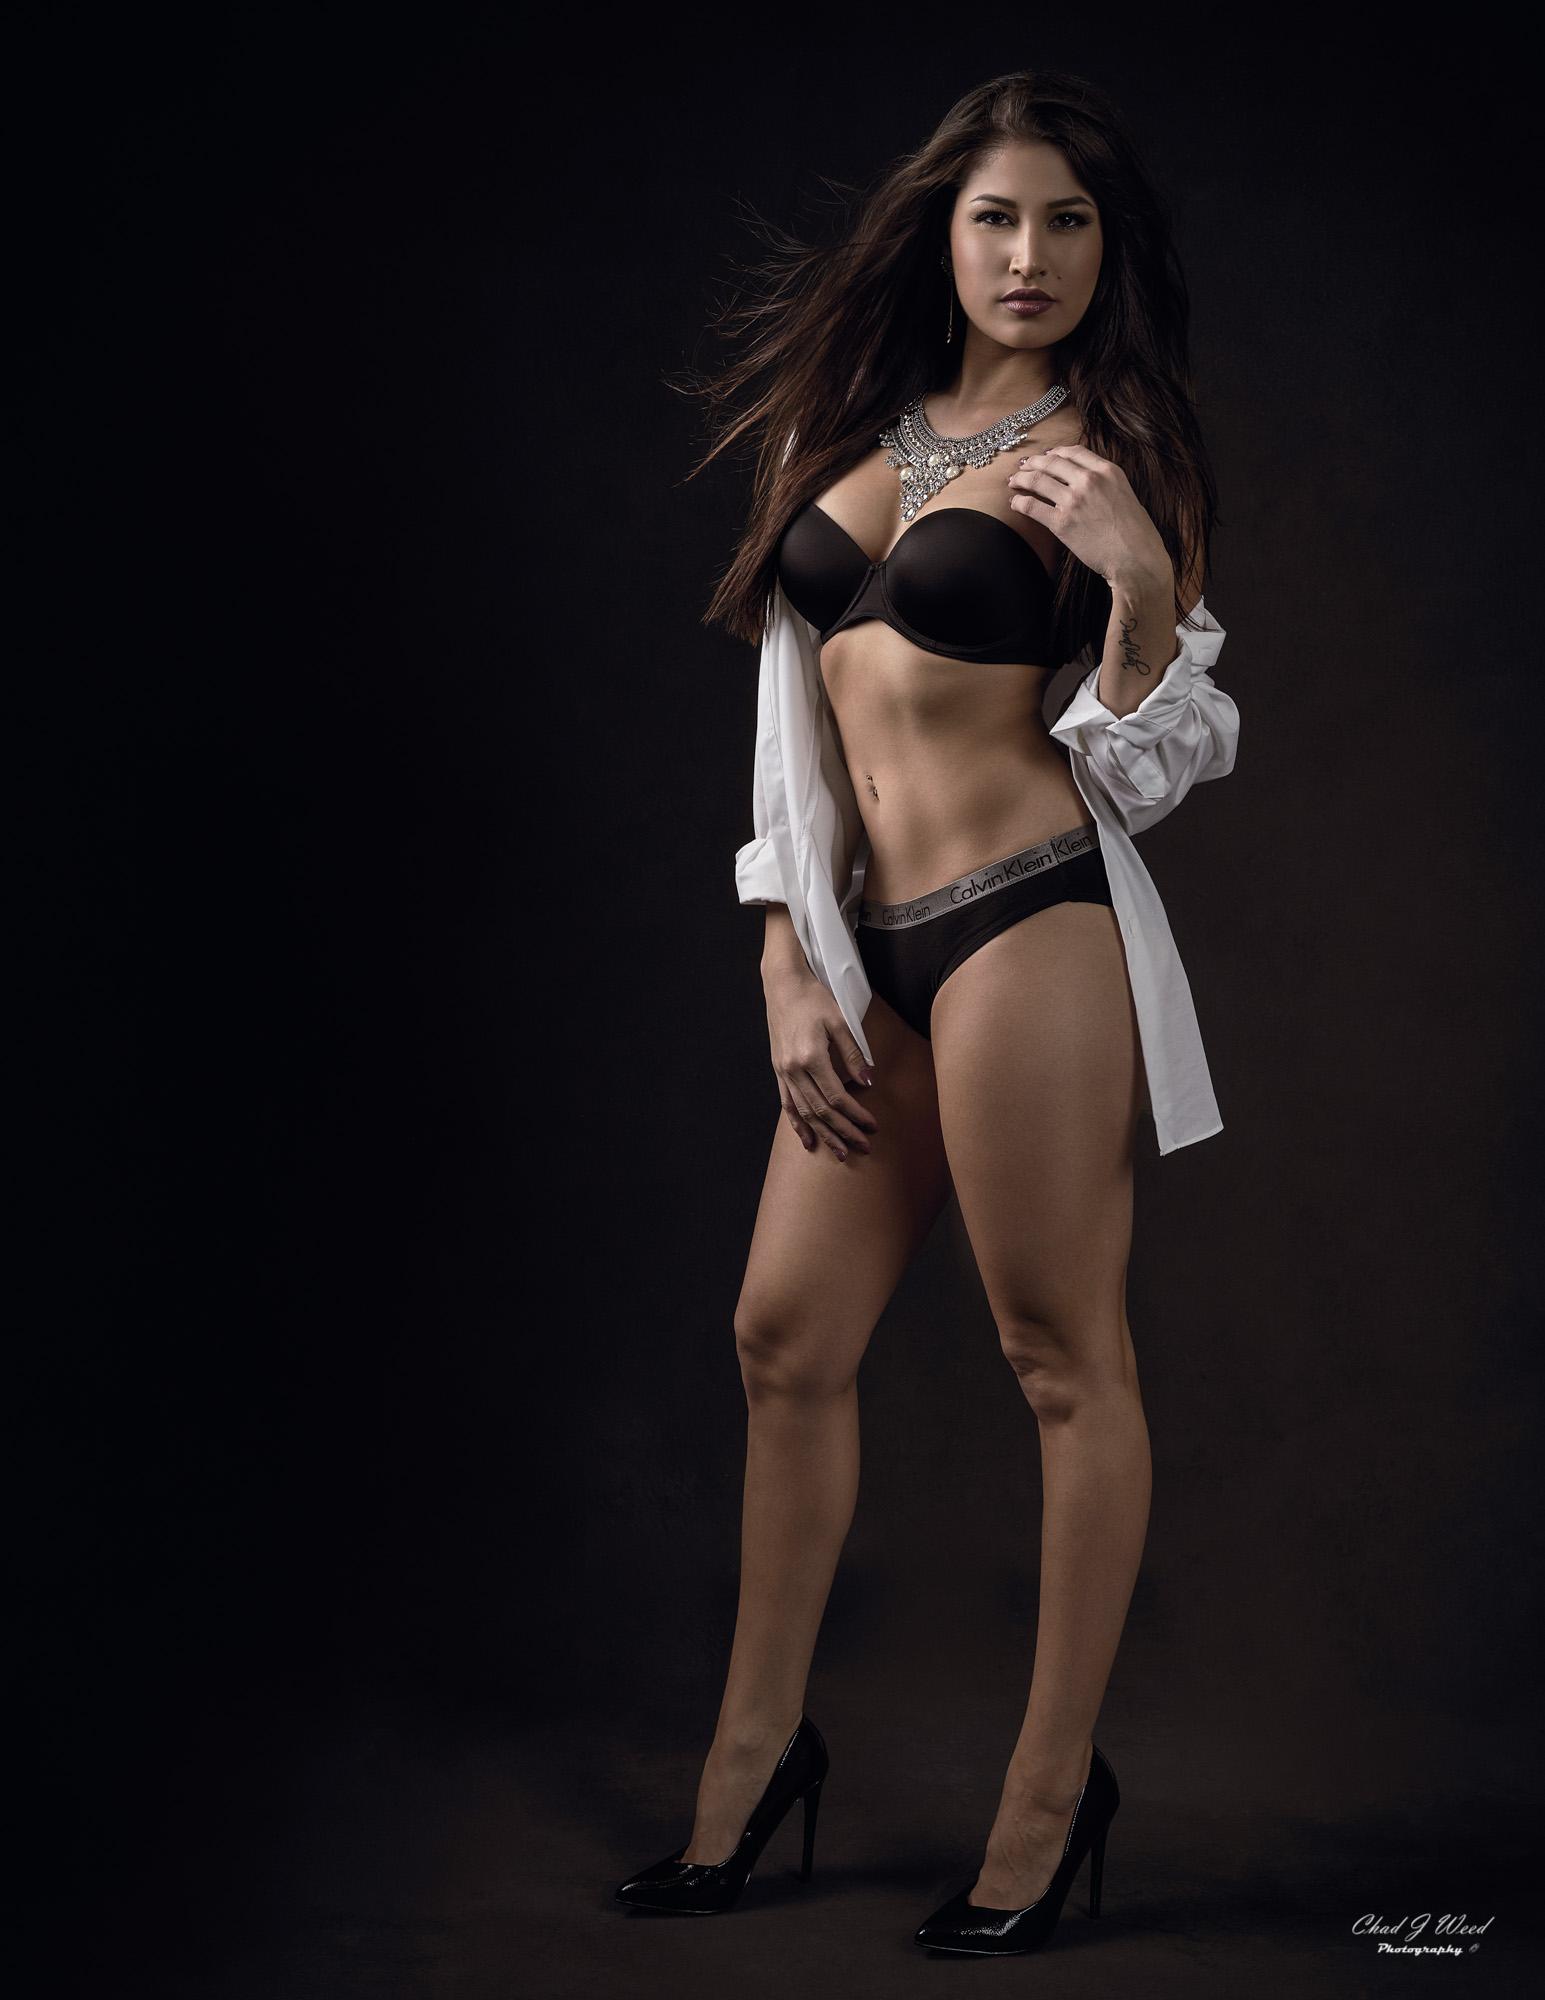 Arizona Fashion Photographer Chad Weed with Fitness Model Ashly - My White Shirt 2